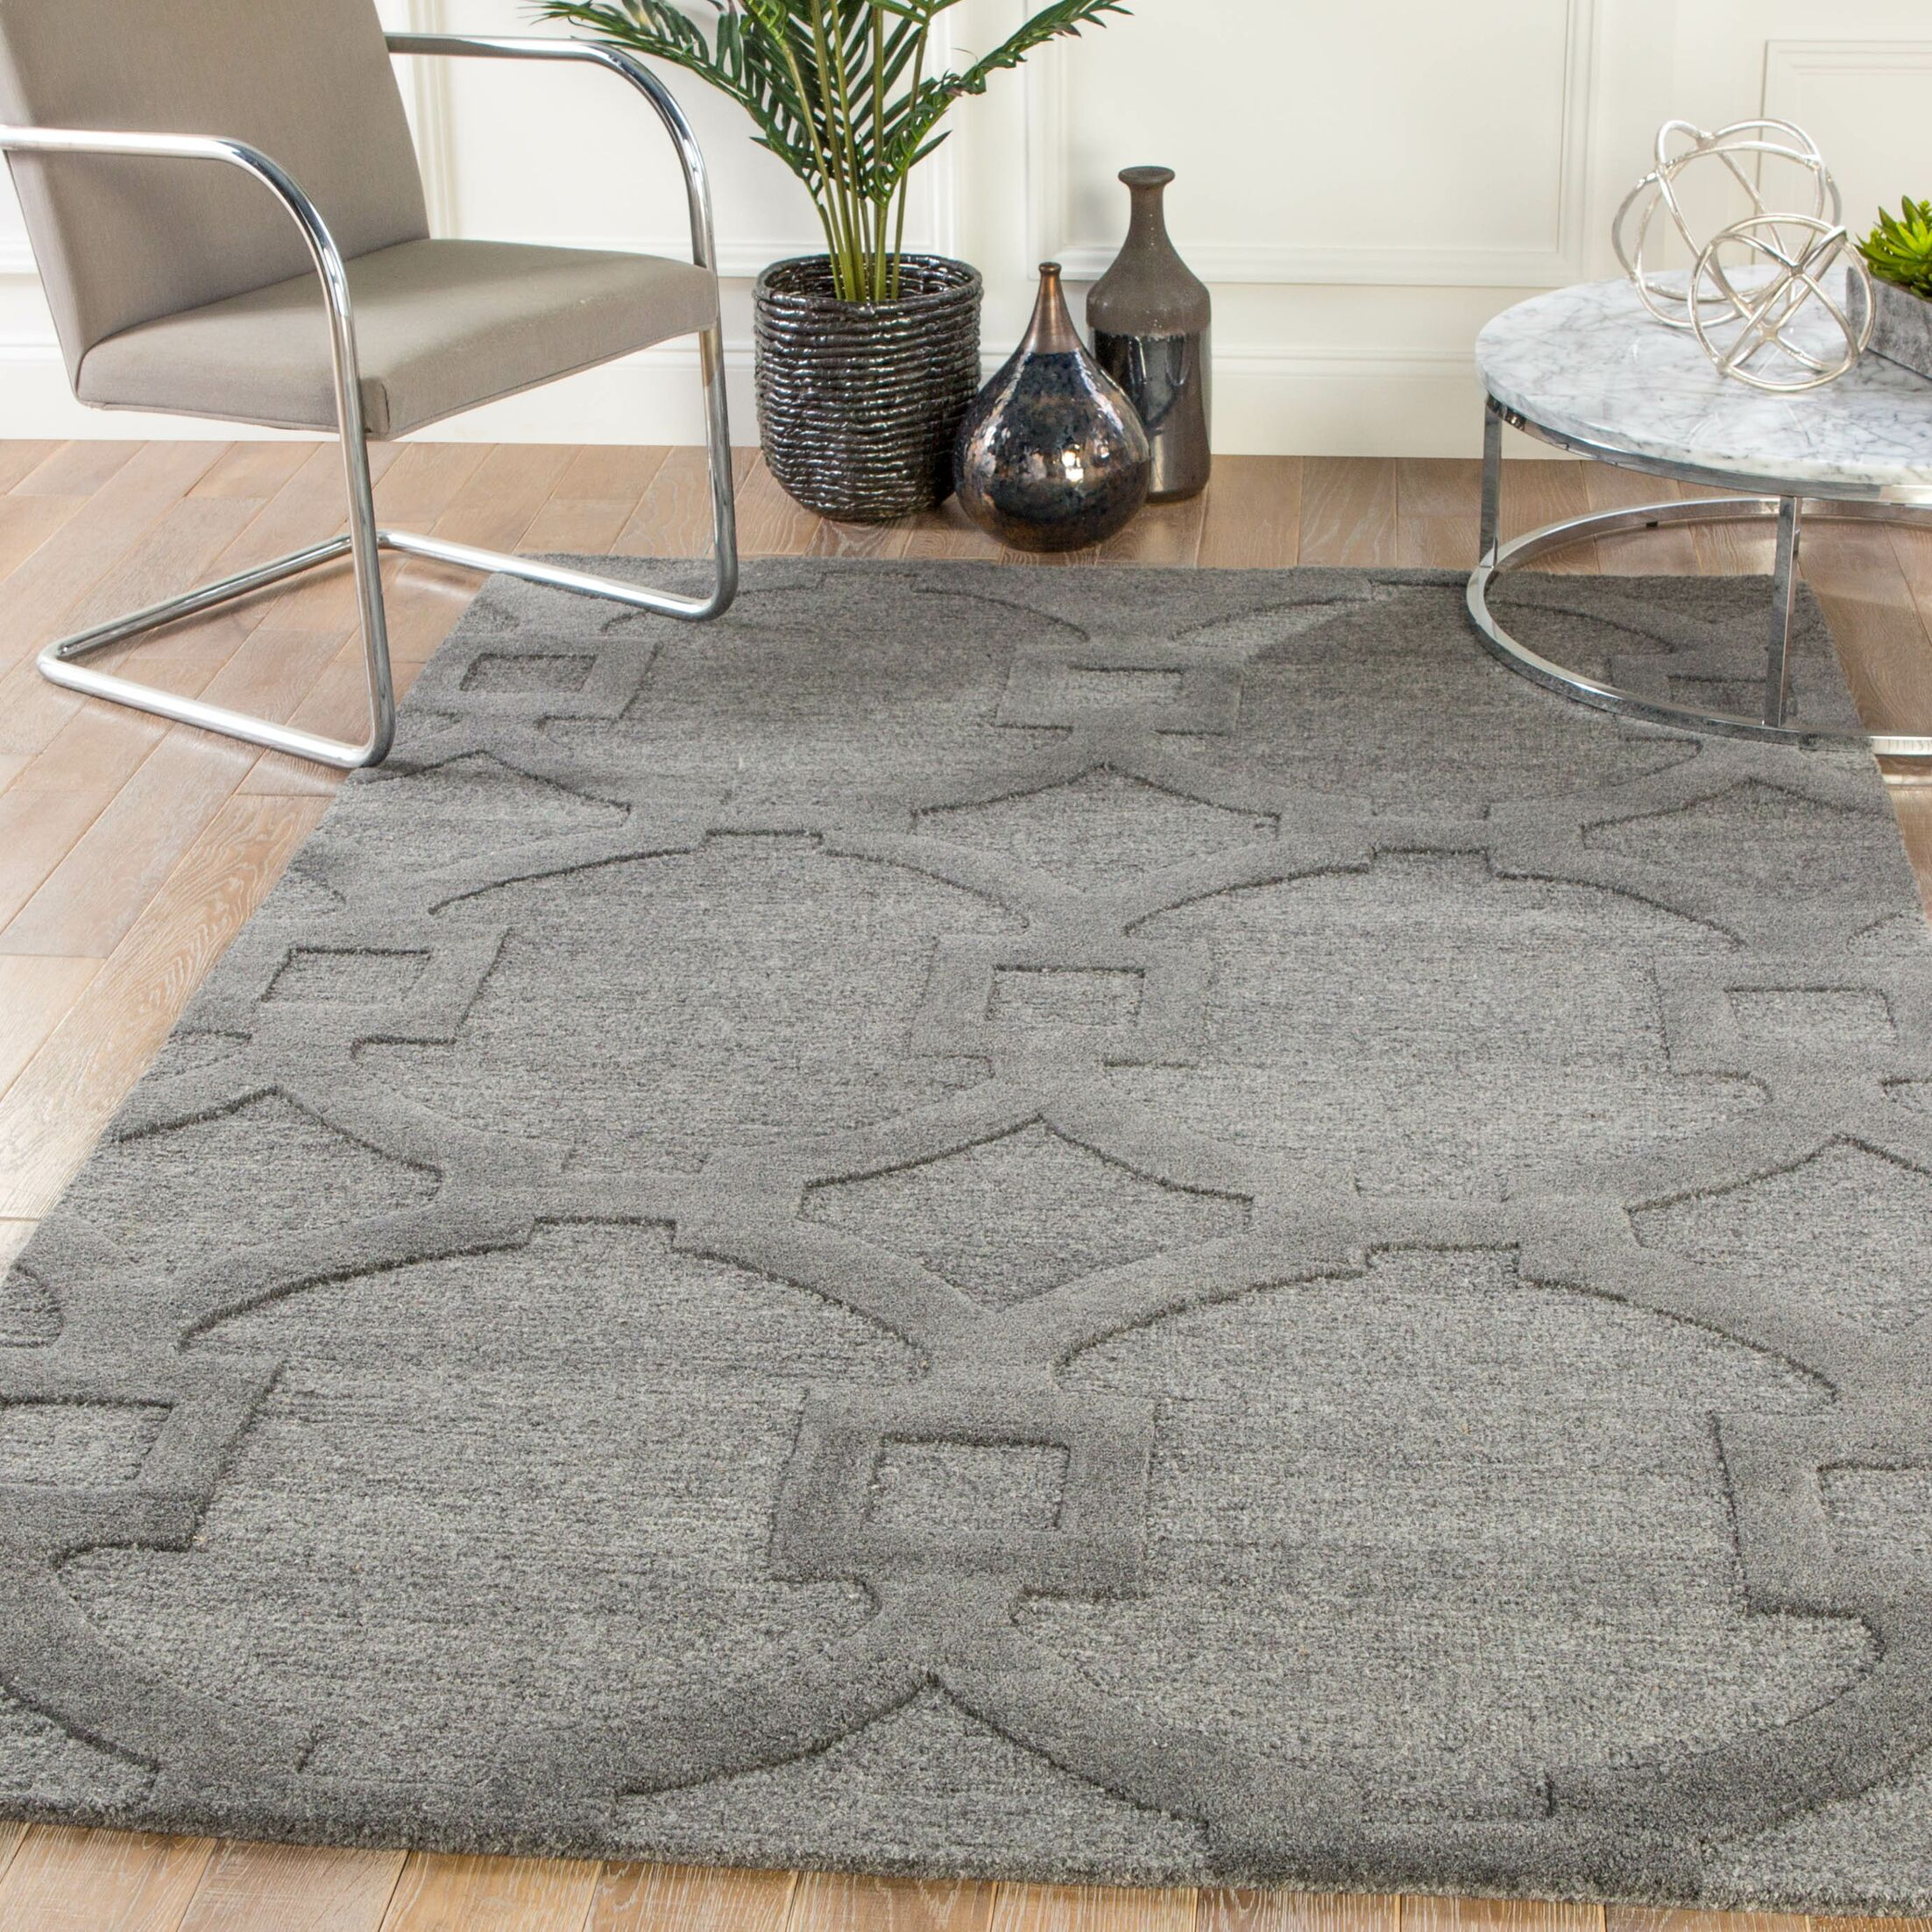 Bohara Trellis Hand-Tufted Wool Gray Area Rug Rug Size: Rectangle 2' x 3'